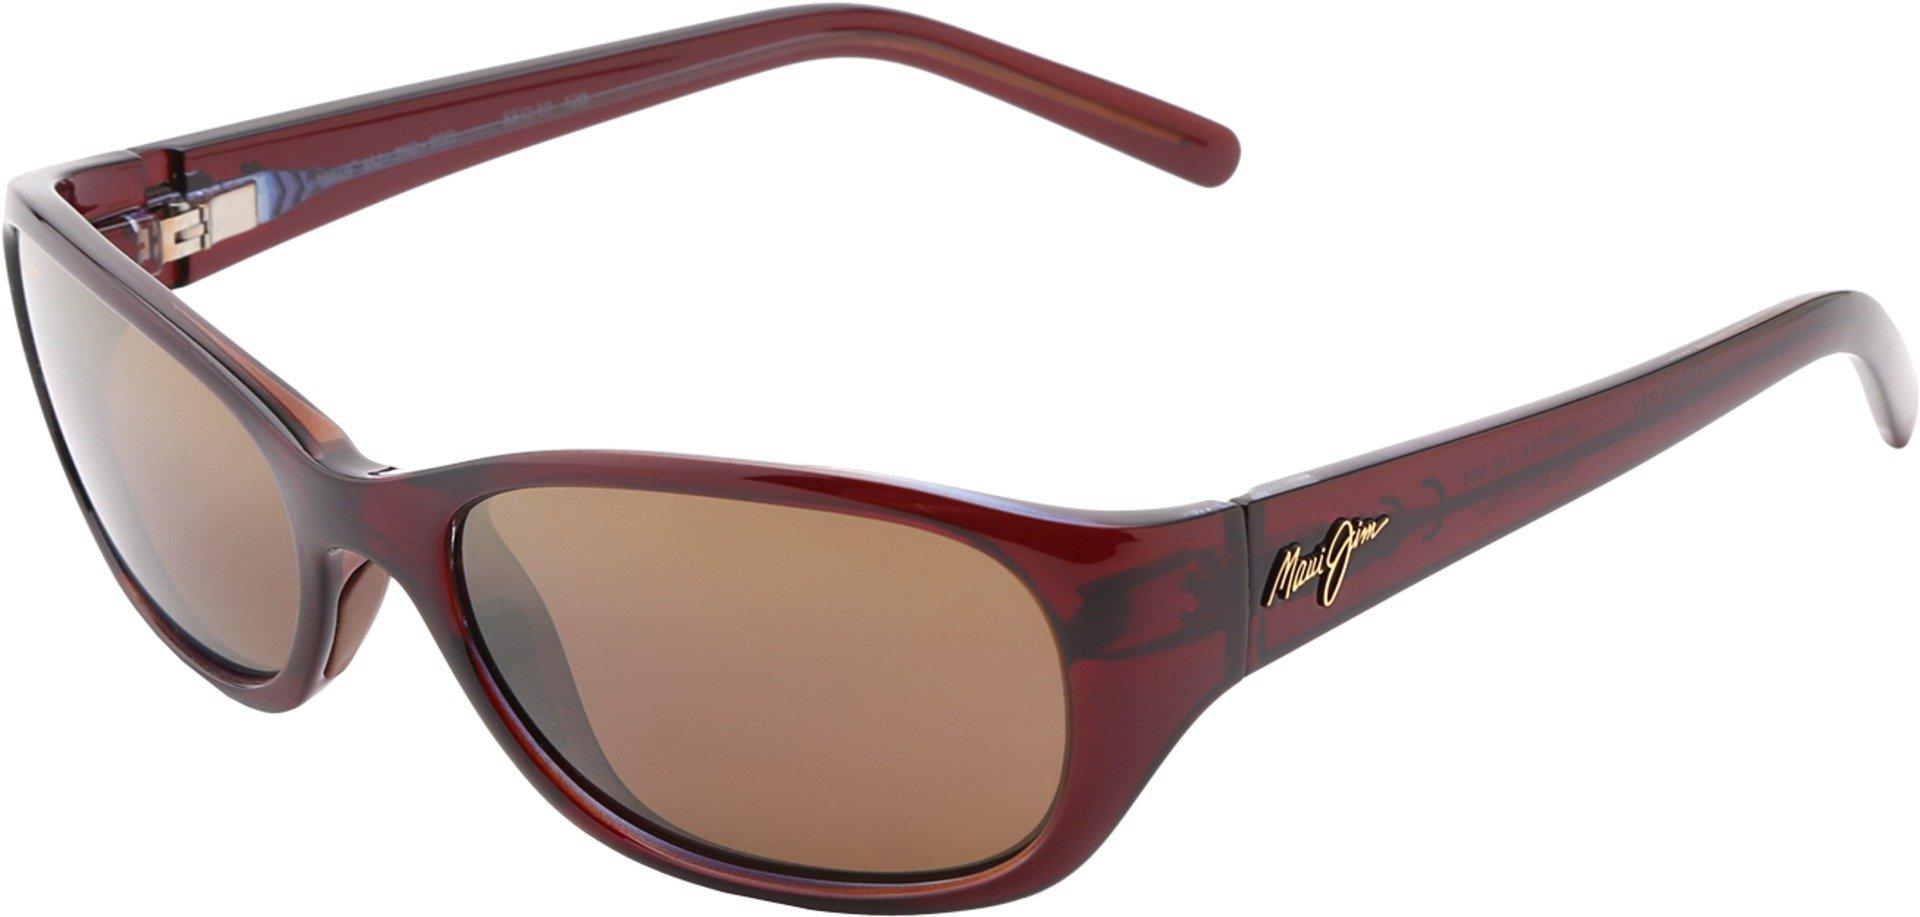 Maui Jim Sunglasses - Kuiaha Bay / Frame: Rootbeer Blue Lens: HCL Bronze